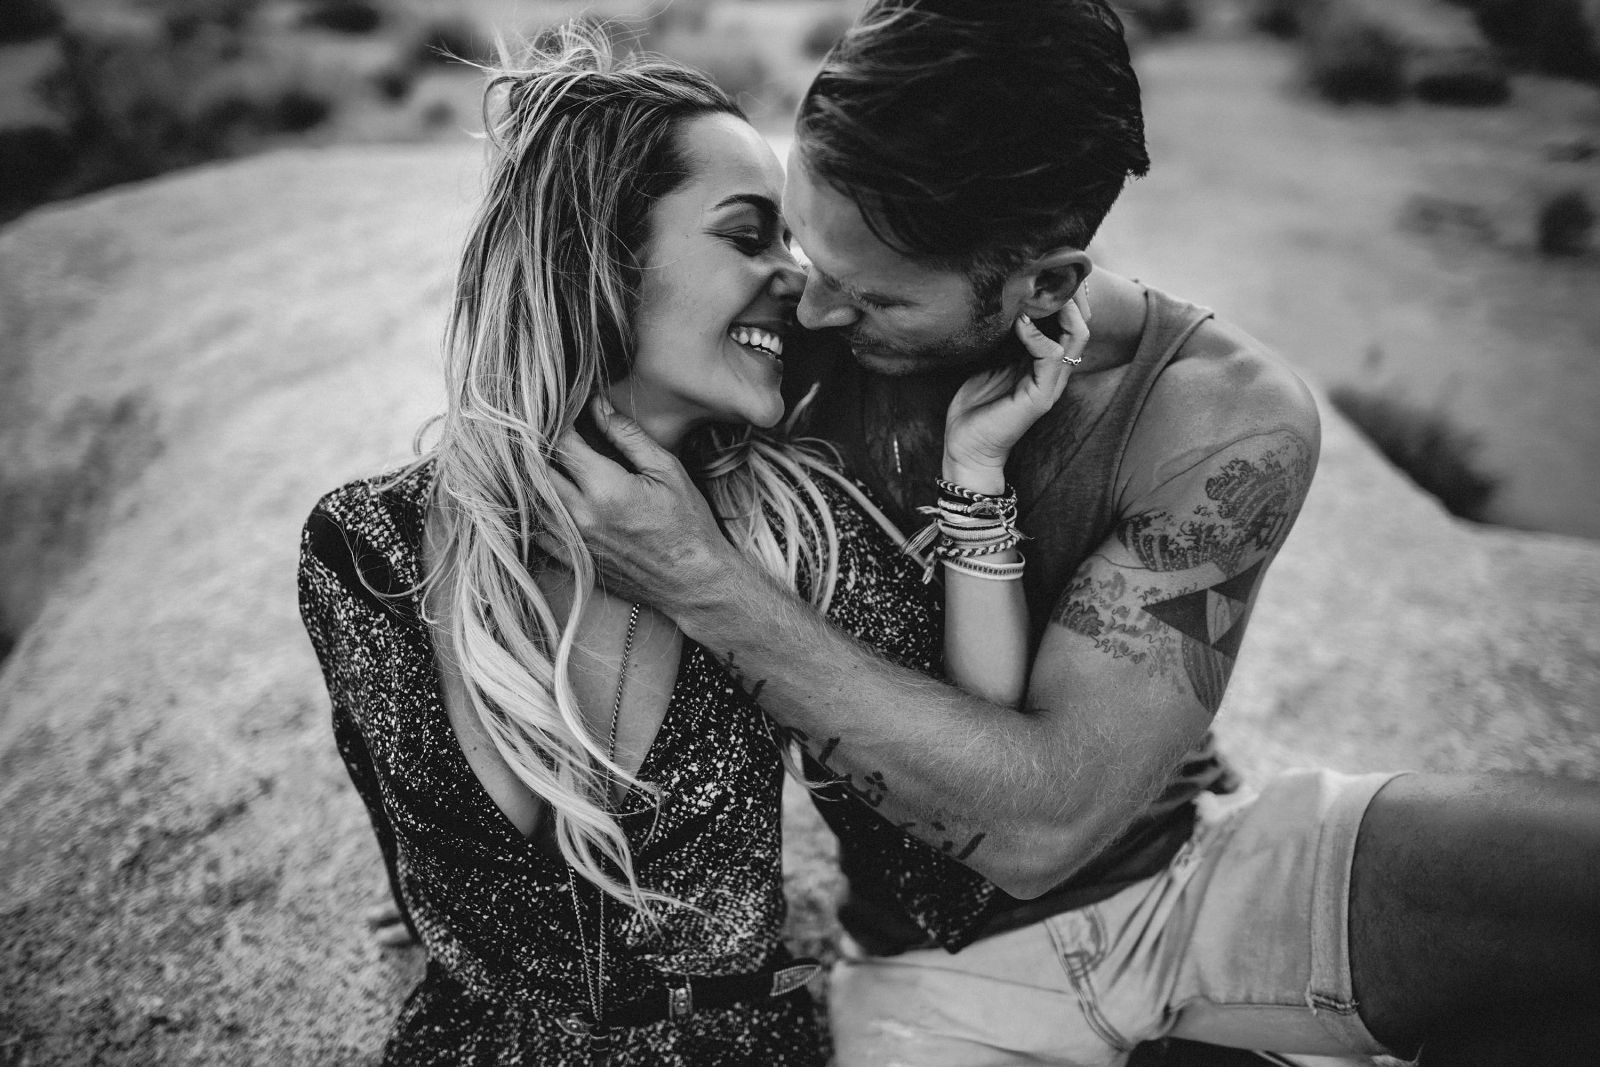 The Most Stunning Engagement Photos We've Seen All Year - HarpersBAZAAR.com